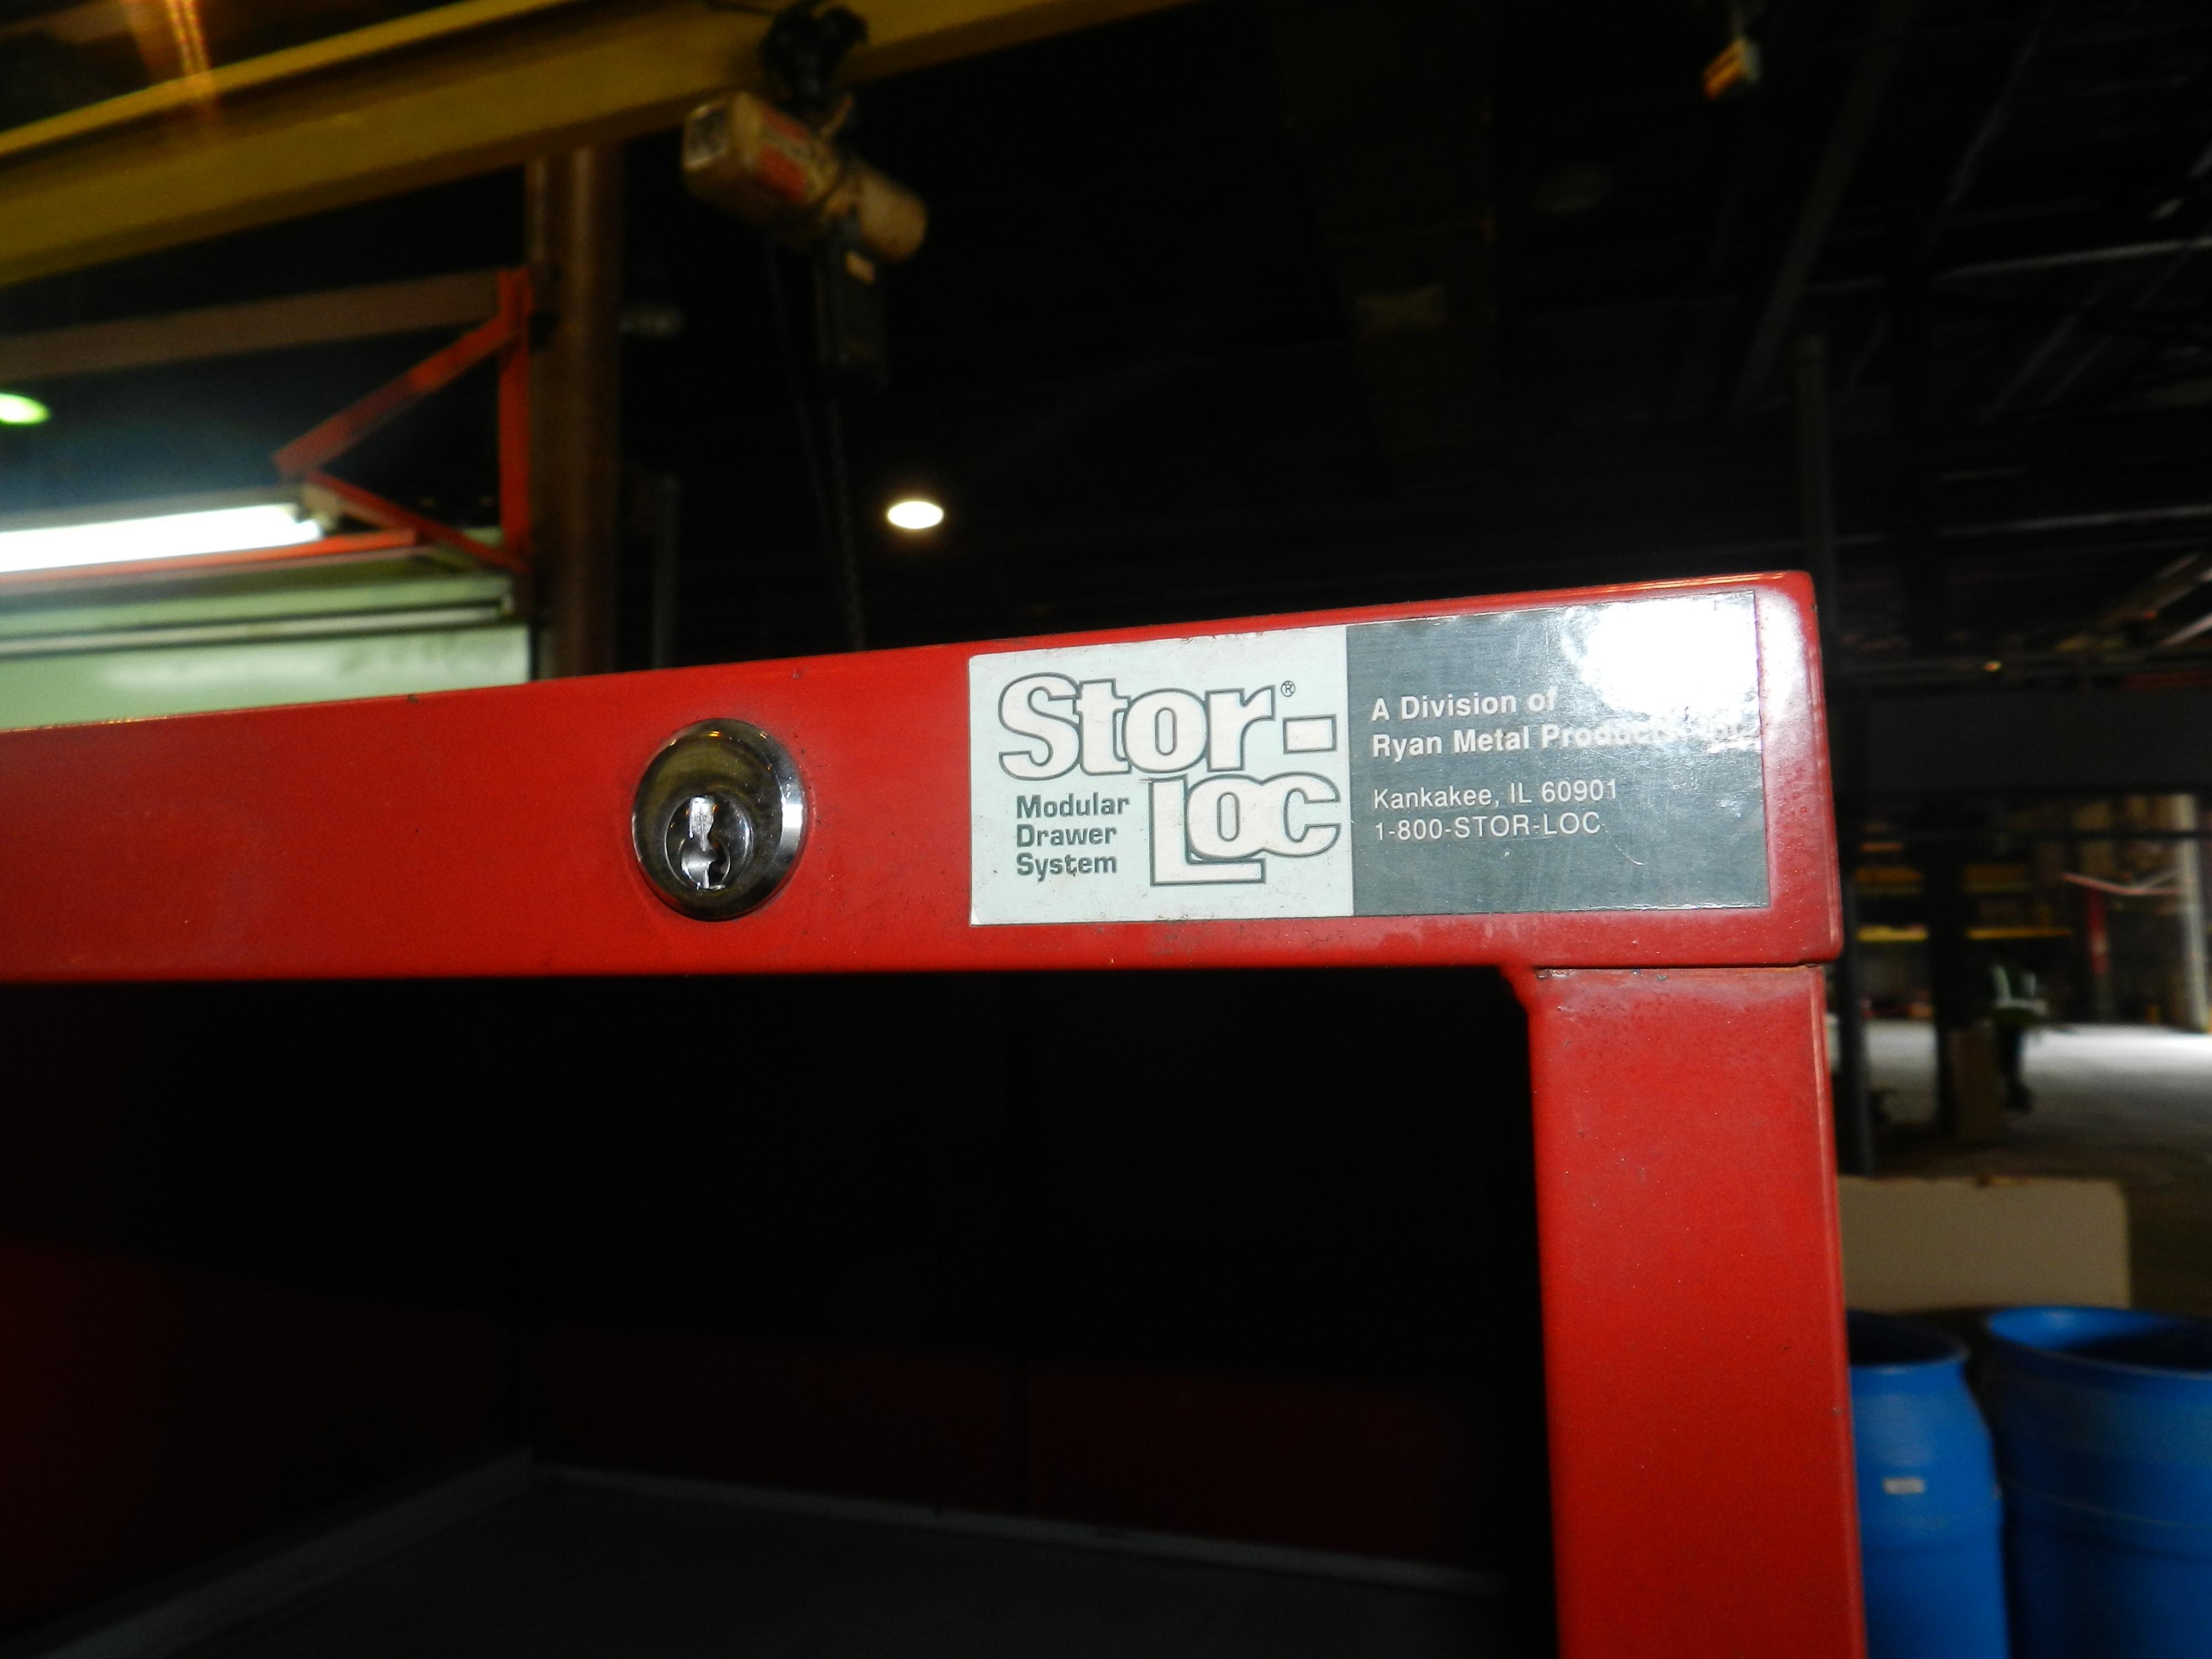 "Lot 70 - Stor-Loc Modular Drawer System 29"" x 28"" x 65.5"" Tool Cabinet"